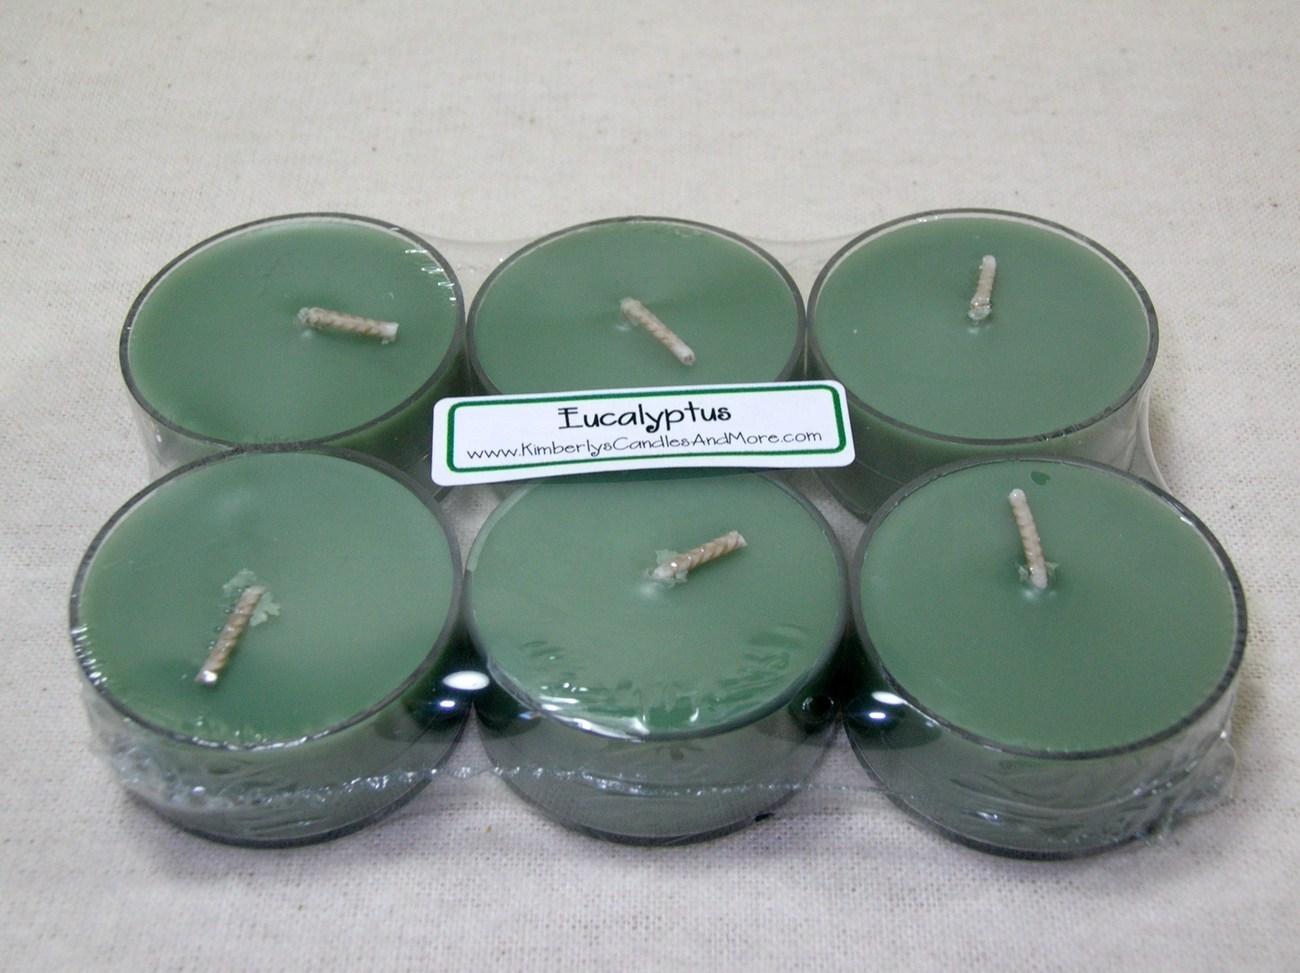 Tealight eucalyptus